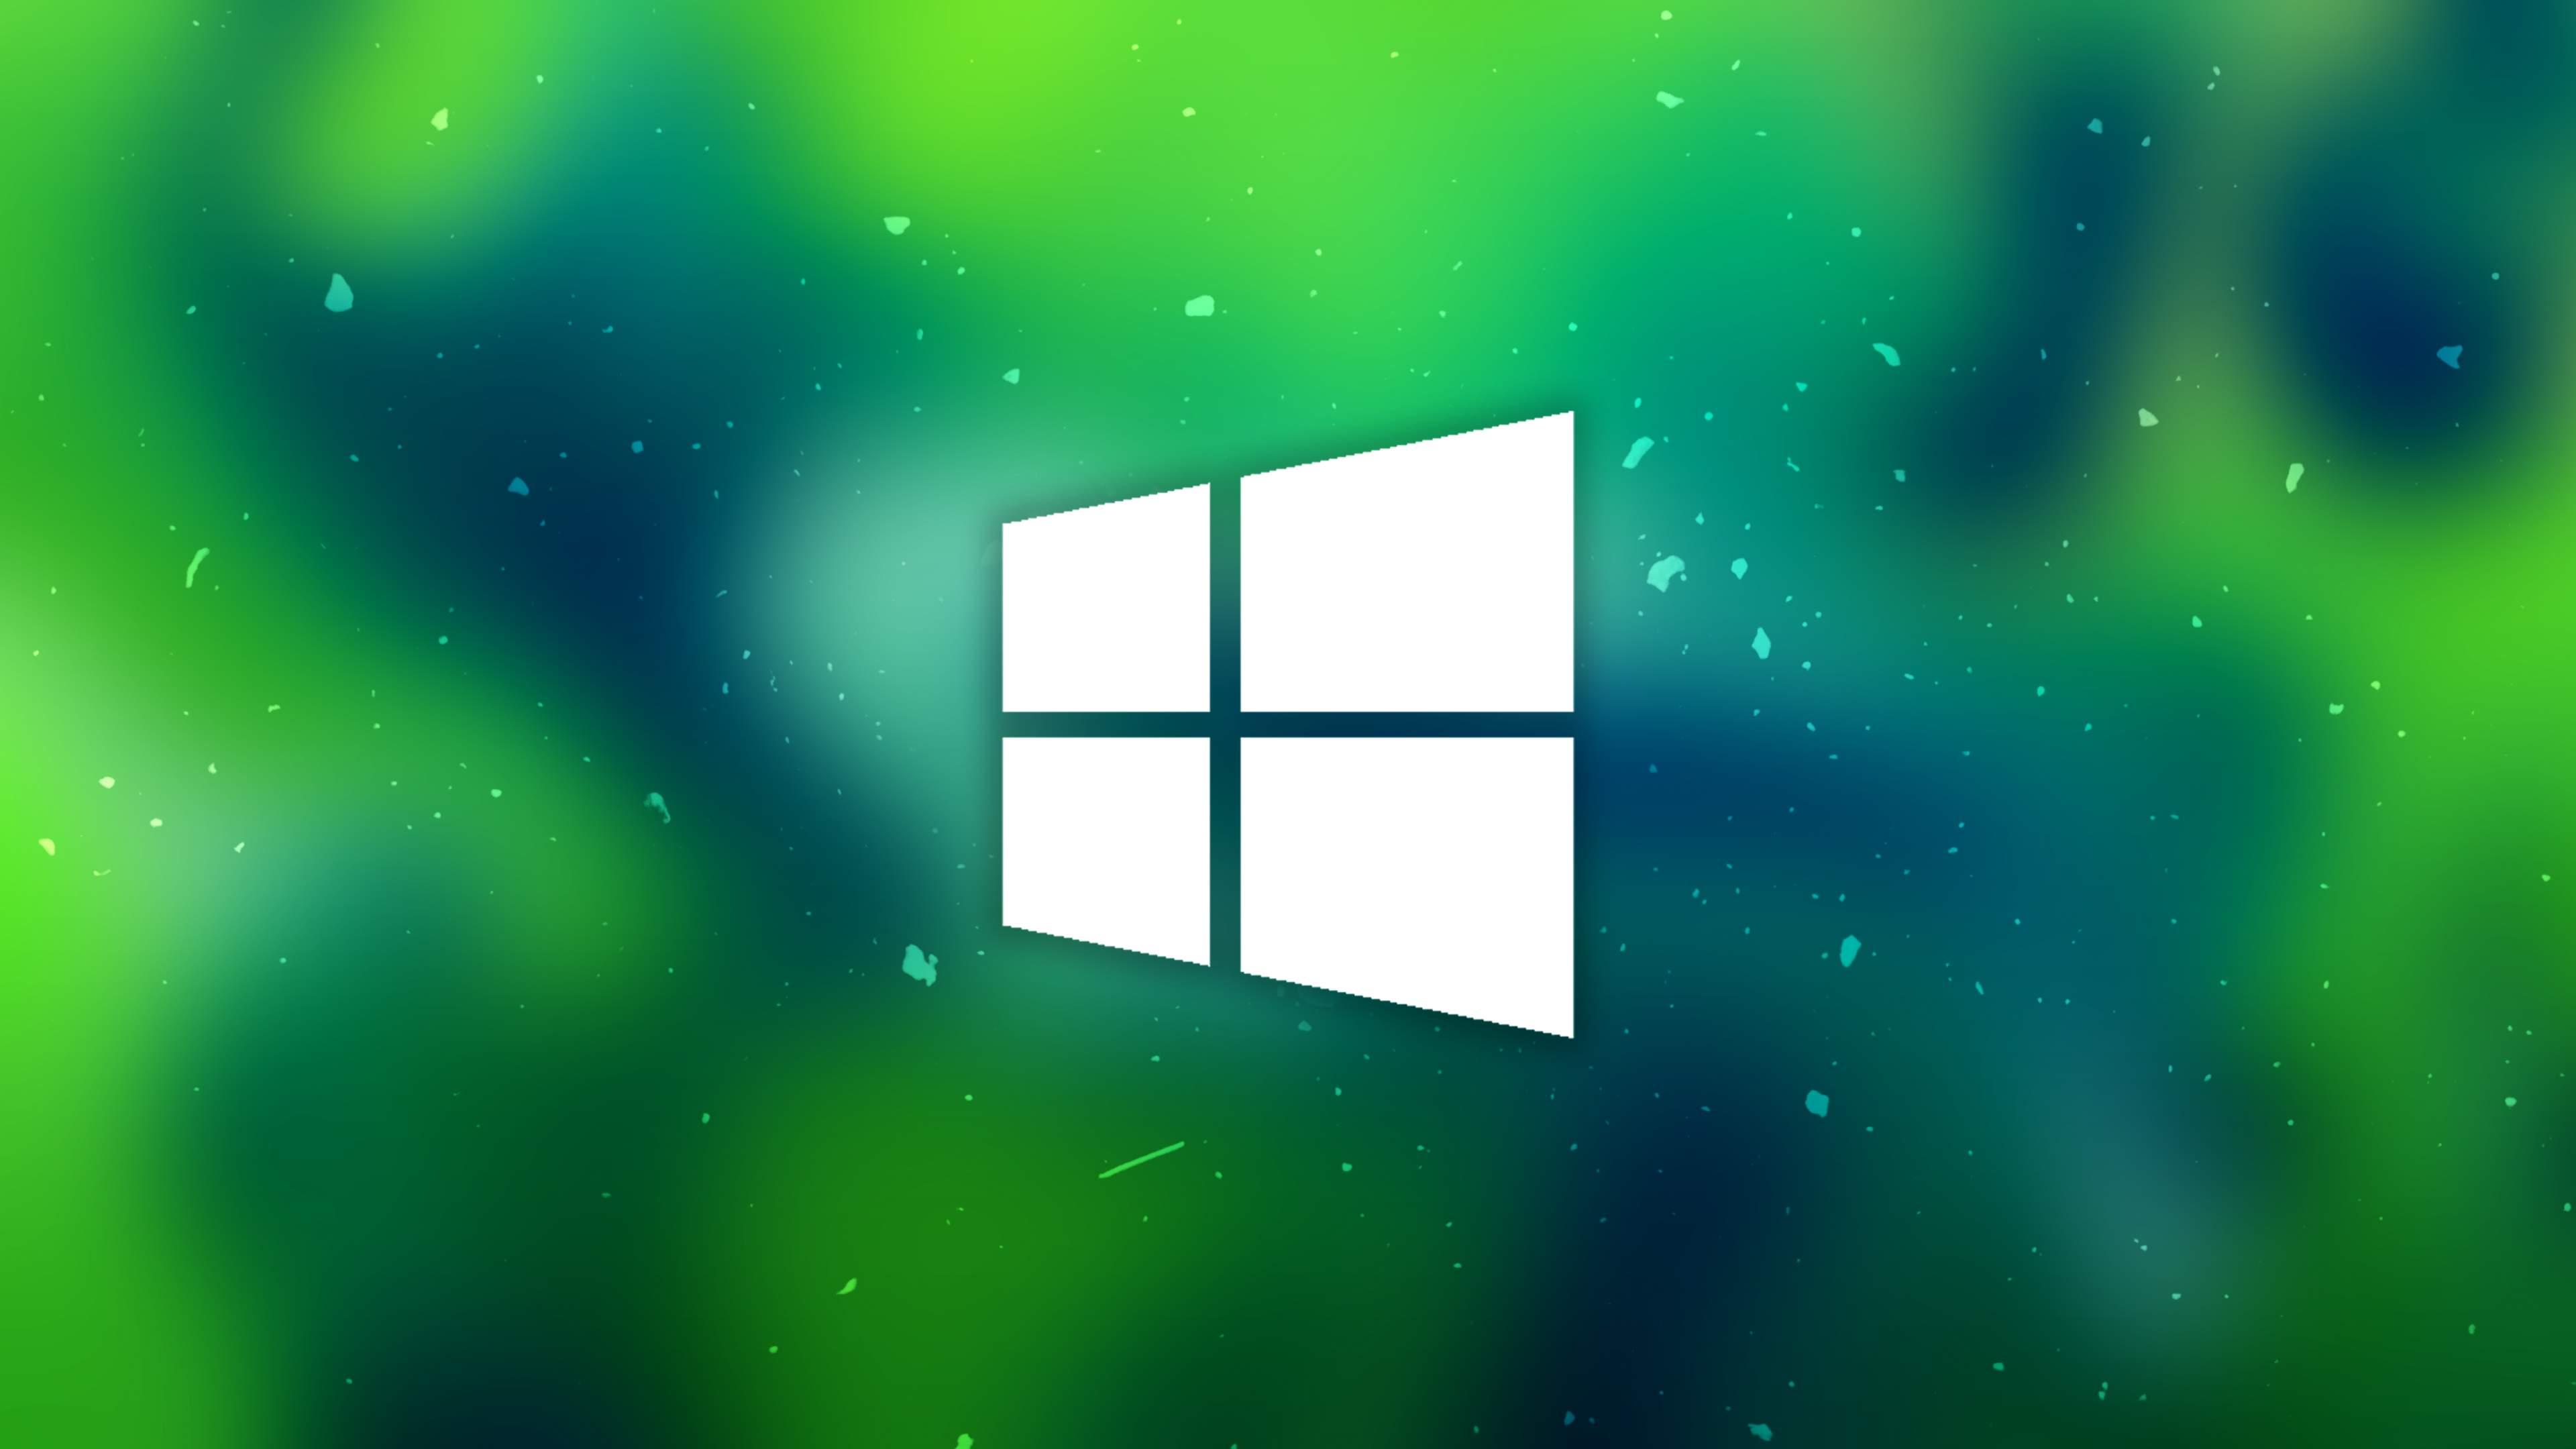 4k windows 10 wallpapers